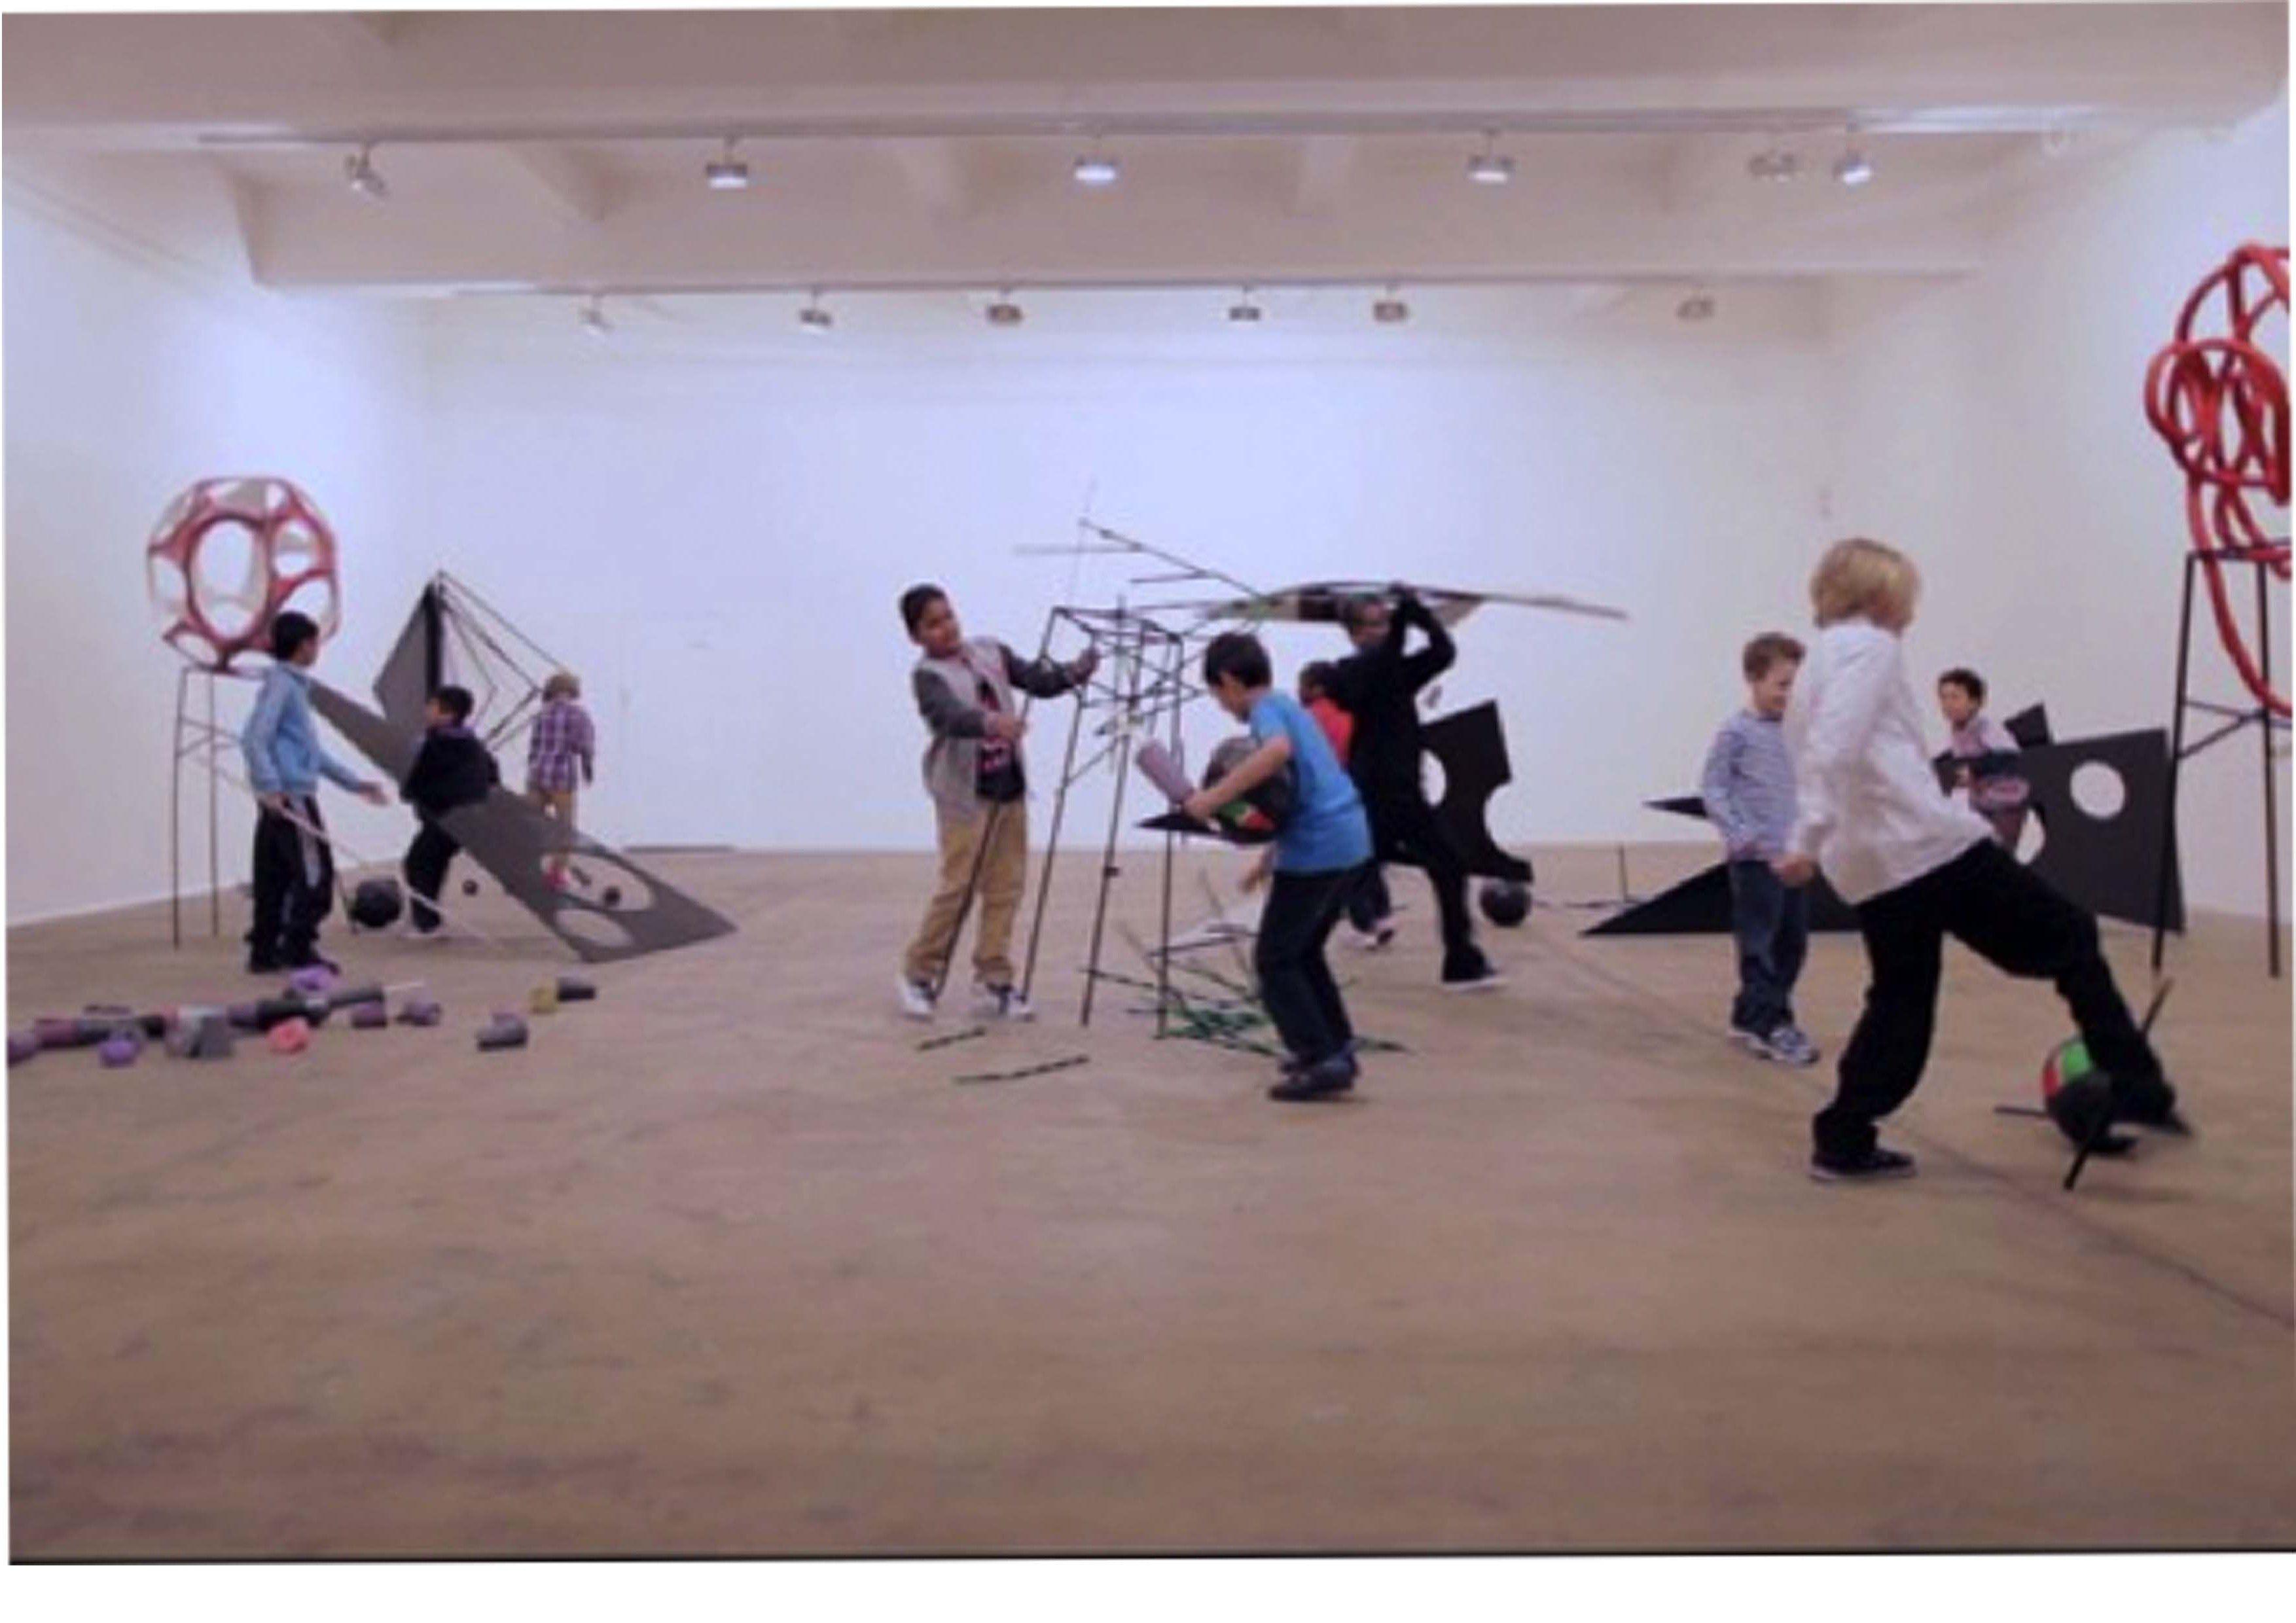 Eva-Rothschild-Boys-and-Sculpture-2012-video-still-HD-video.--e1395231944199